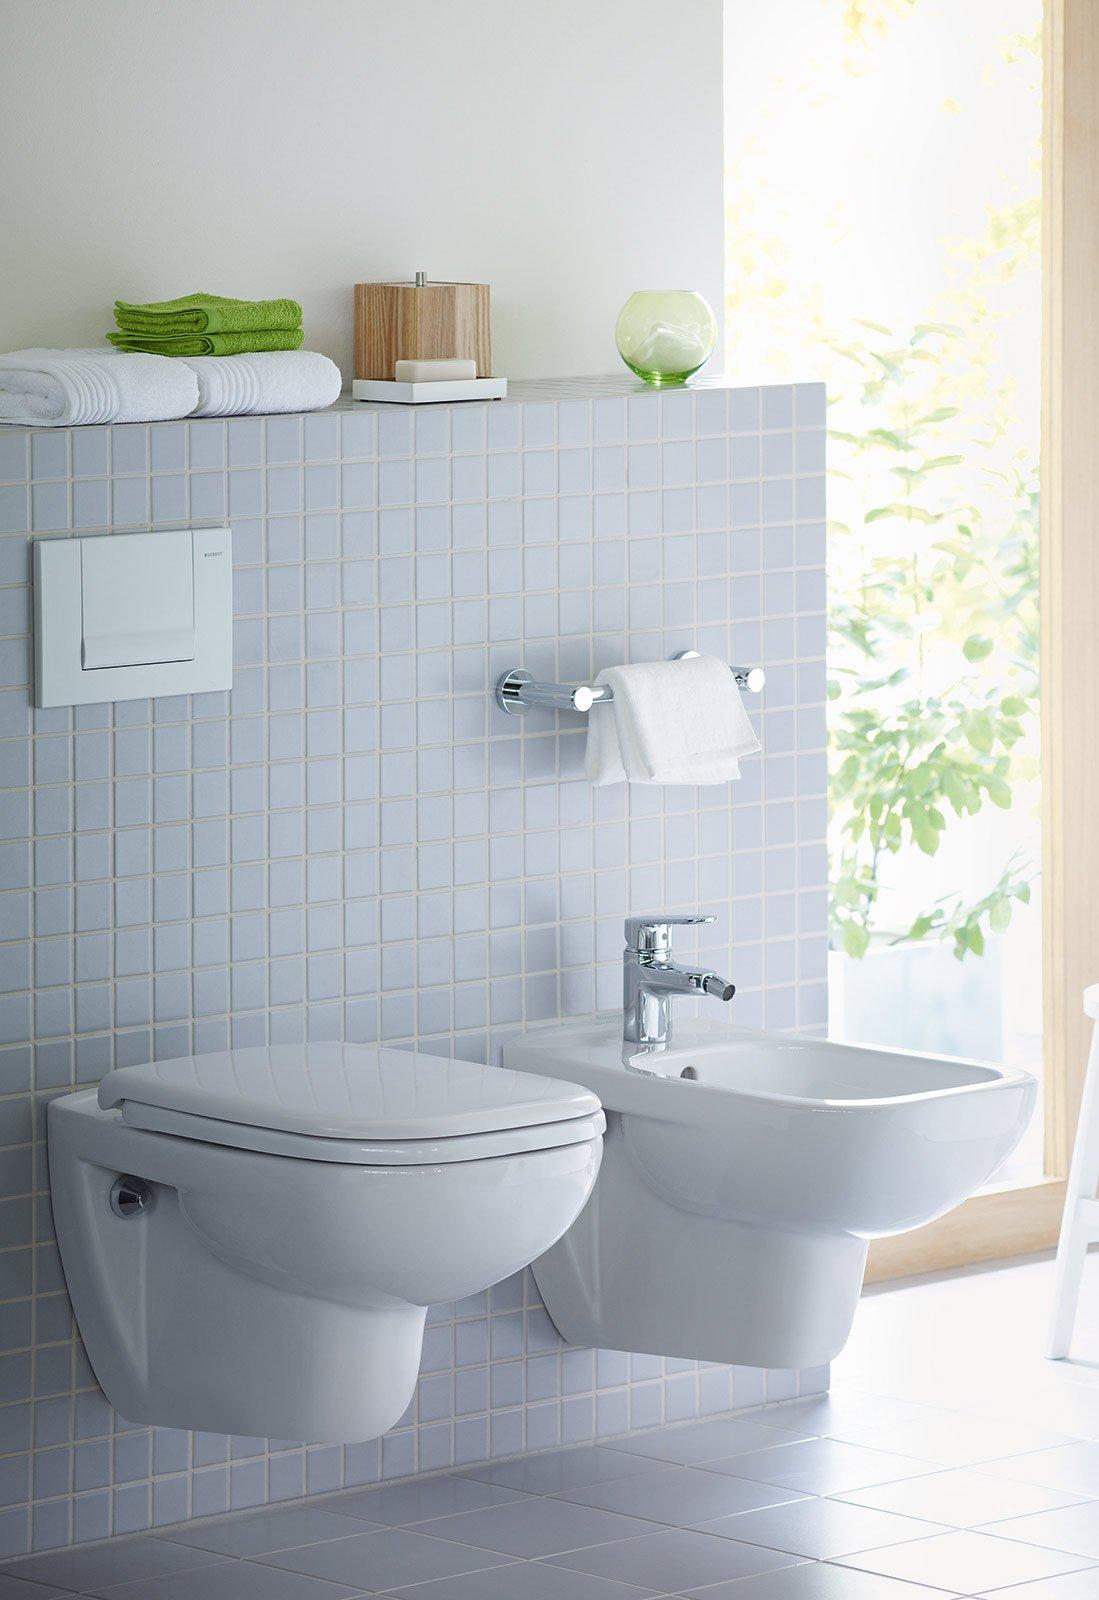 Sanitari: vaso e bidet low cost - Cose di Casa